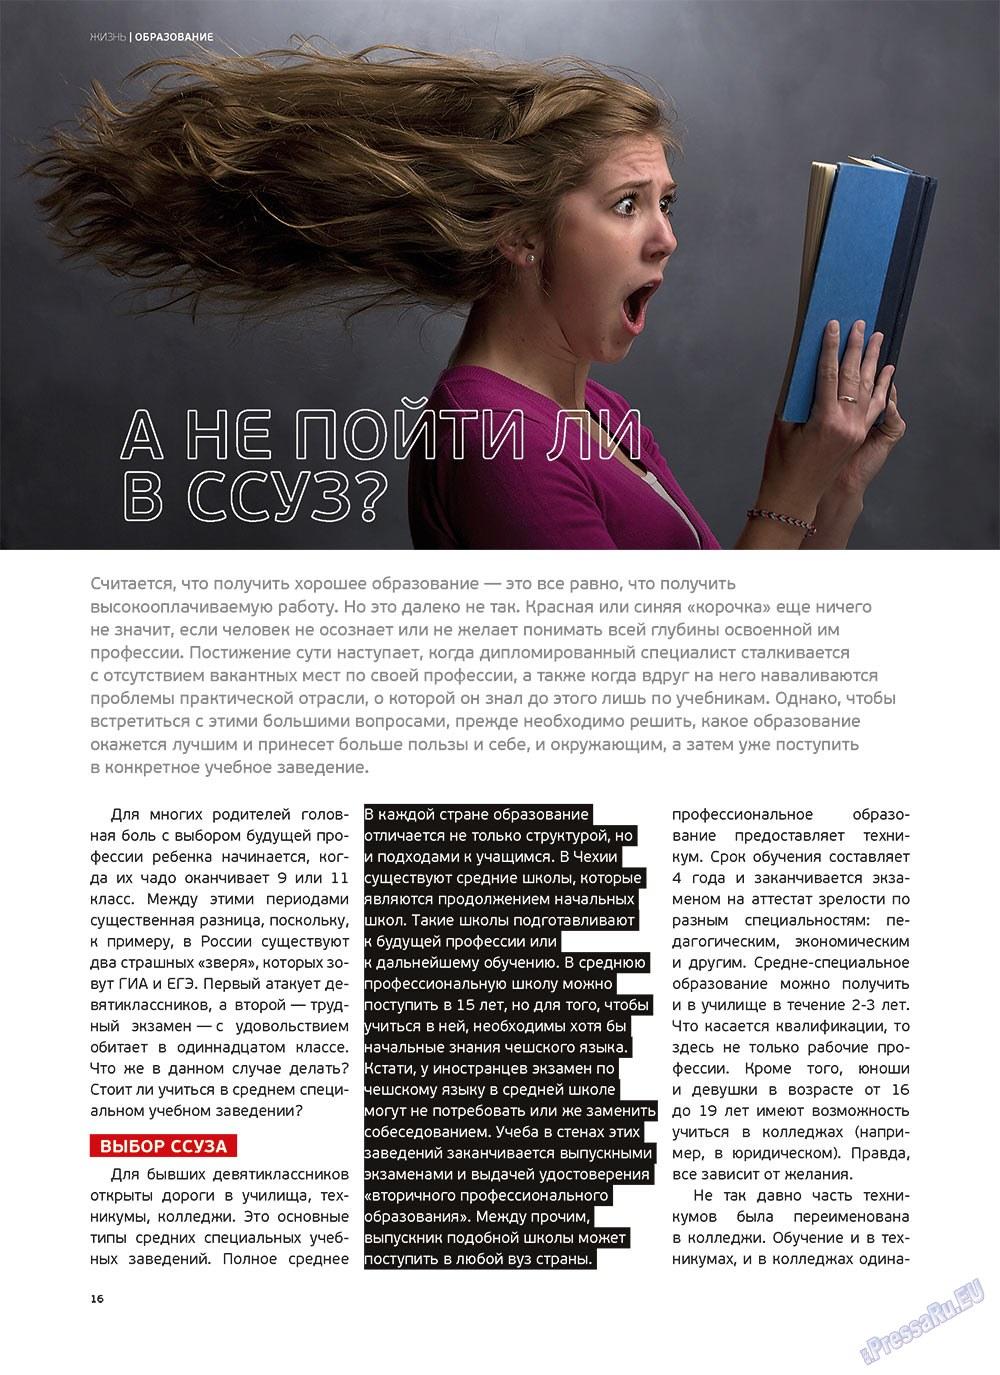 Артек (журнал). 2012 год, номер 6, стр. 18